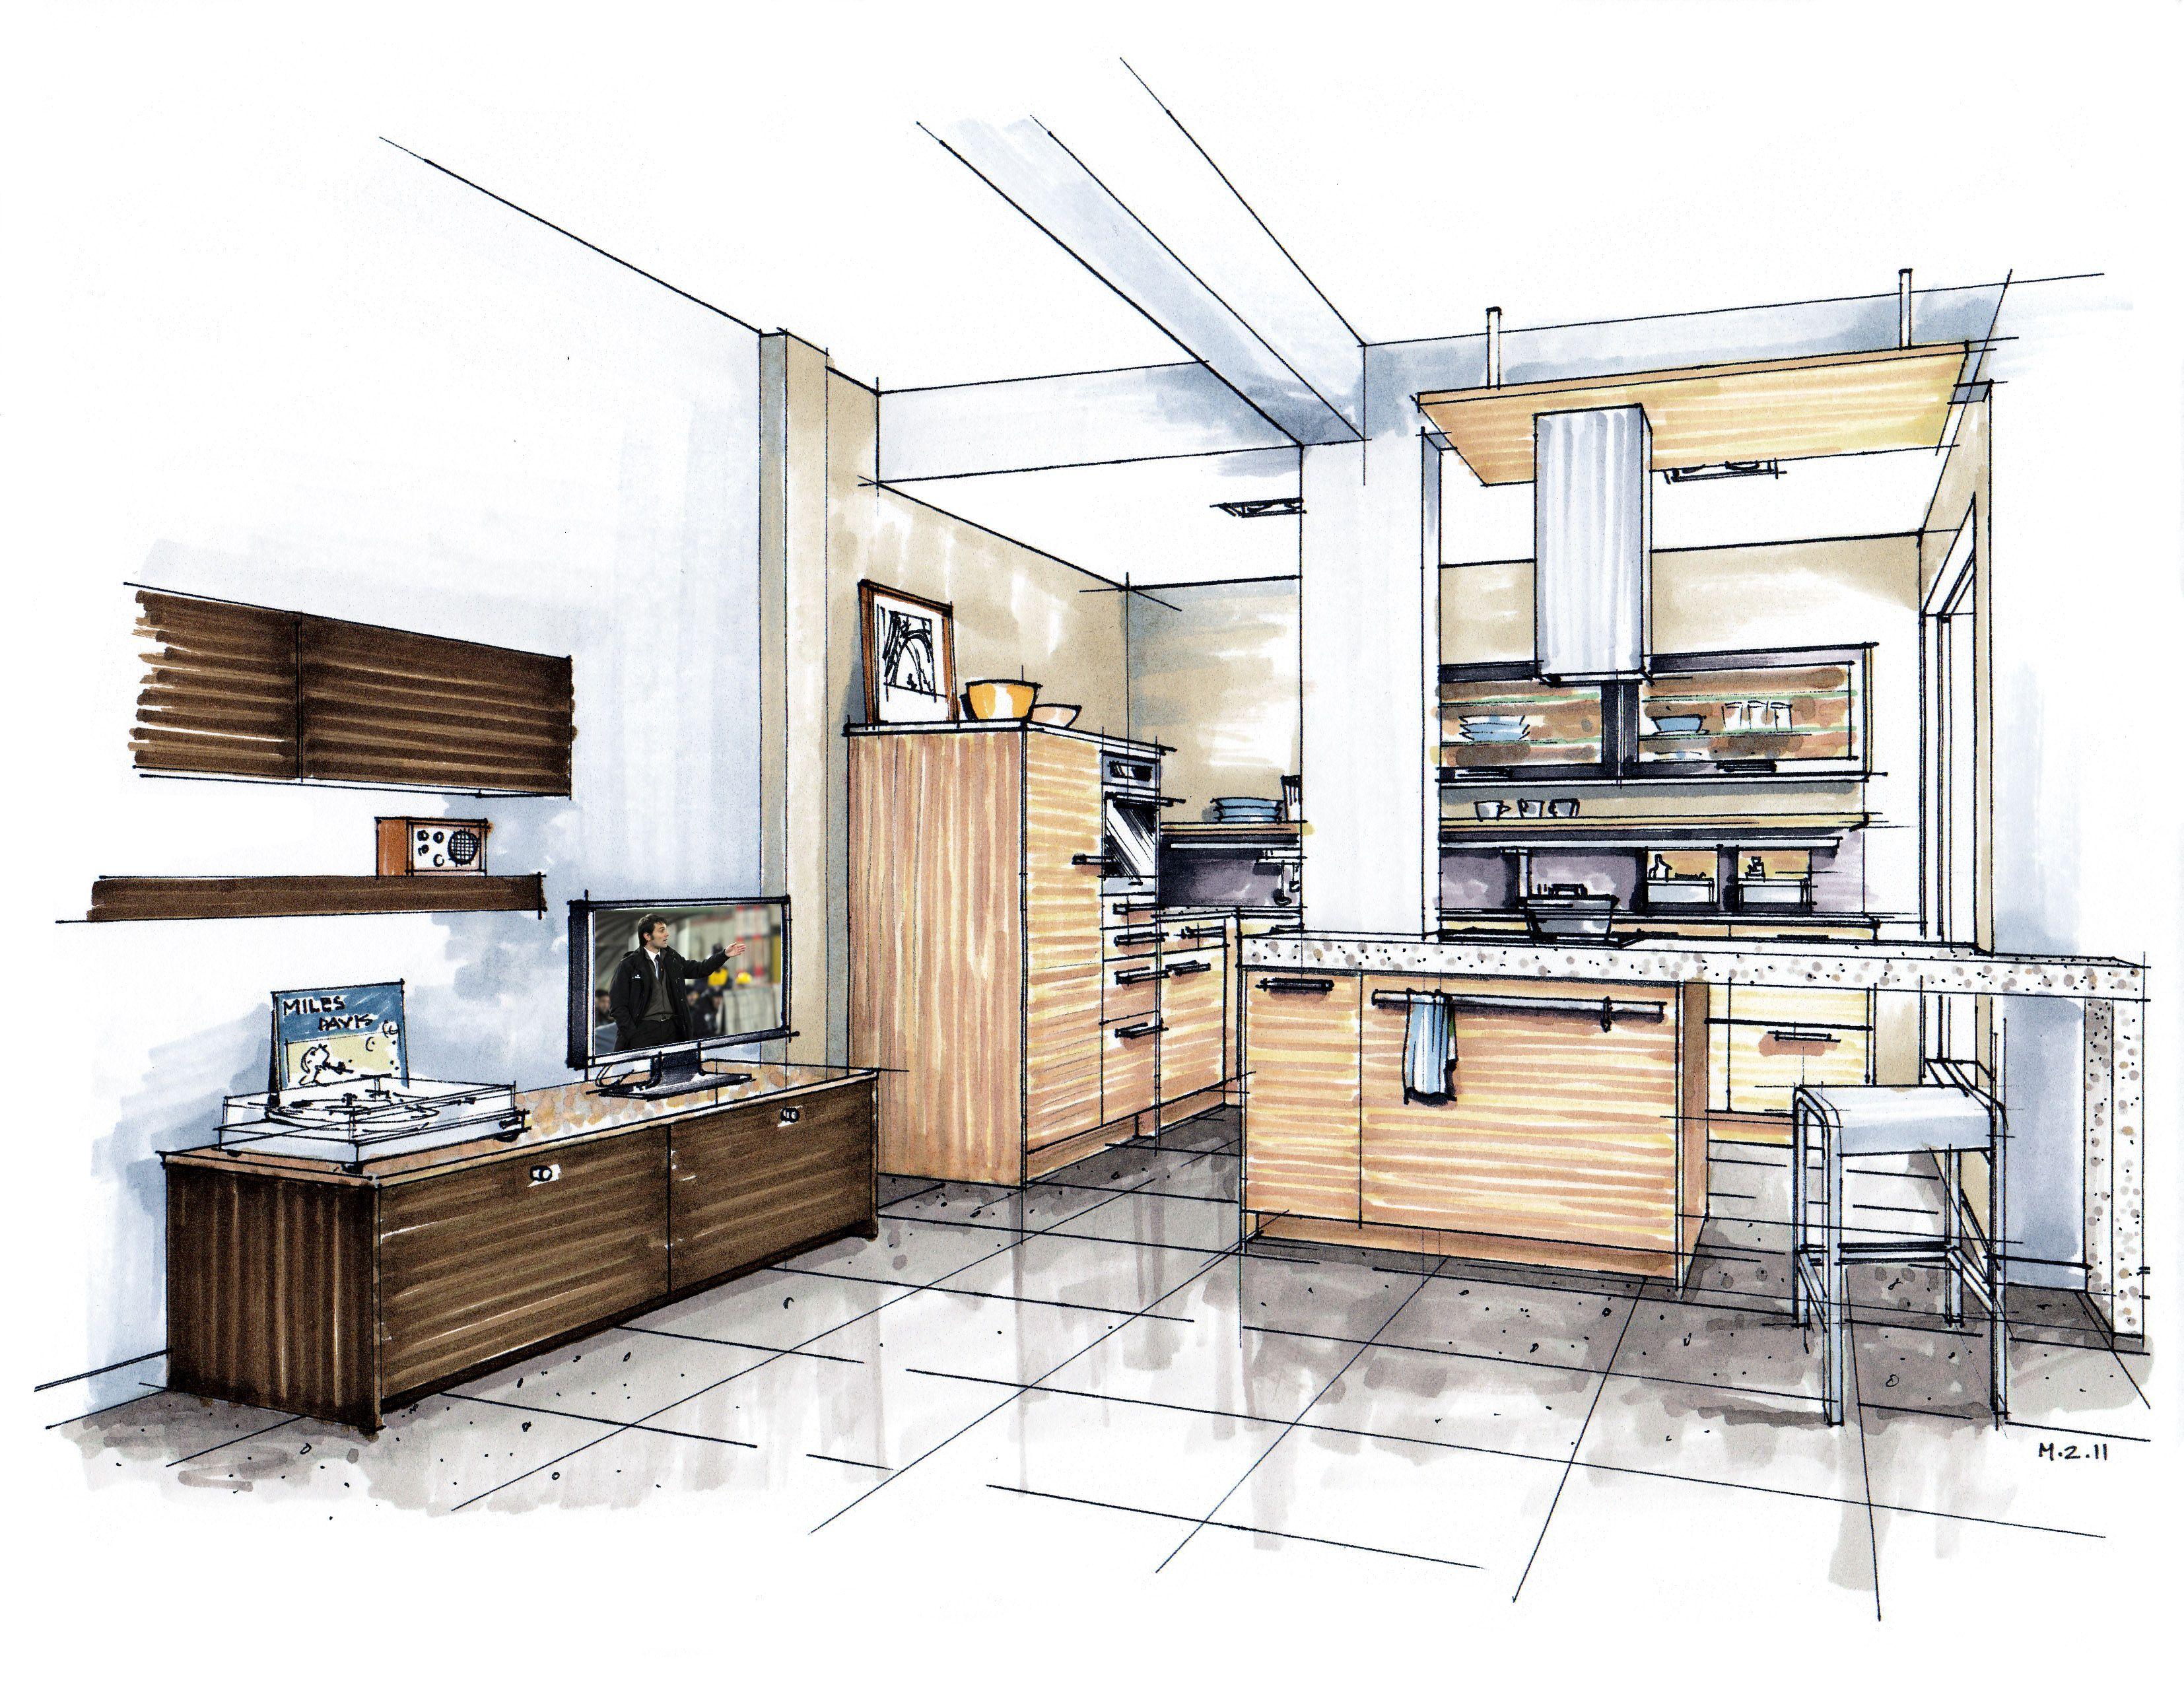 Hand Rendering Mick Ricereto Interior Interior Design